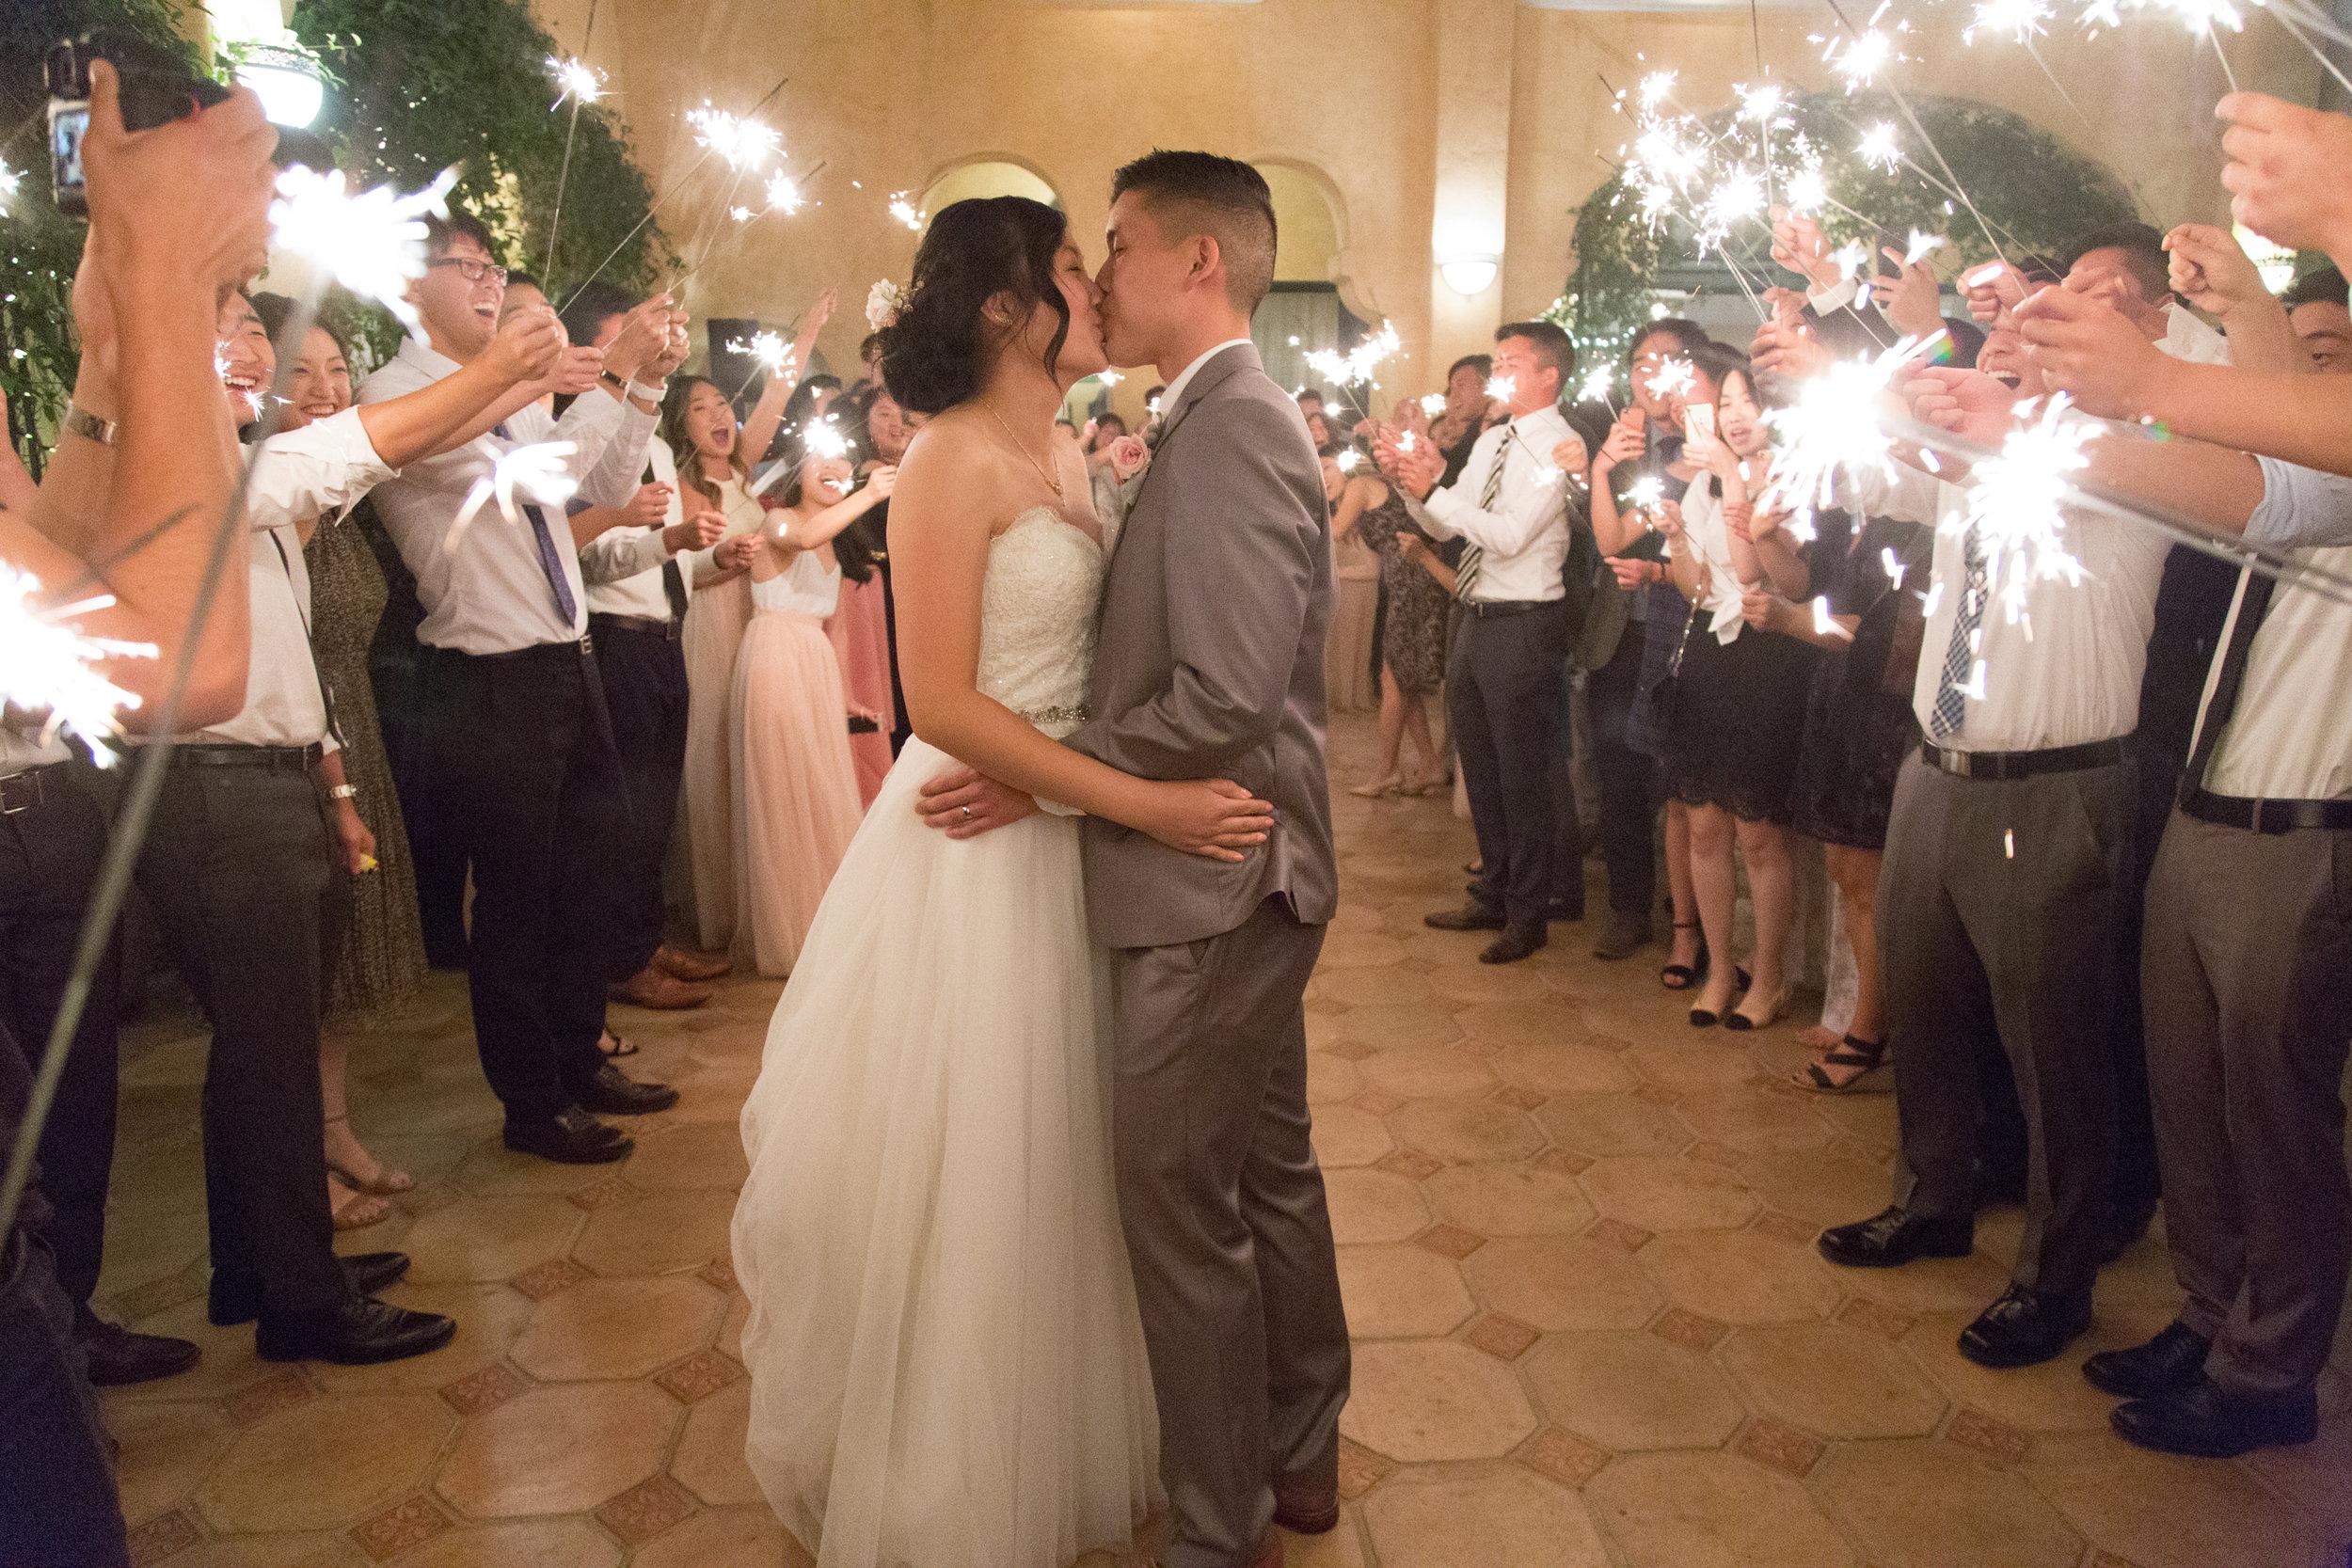 trynhphoto_wedding_photography_Standford_PaloAlto_SF_BayArea_Destination_OC_HA-585.jpg